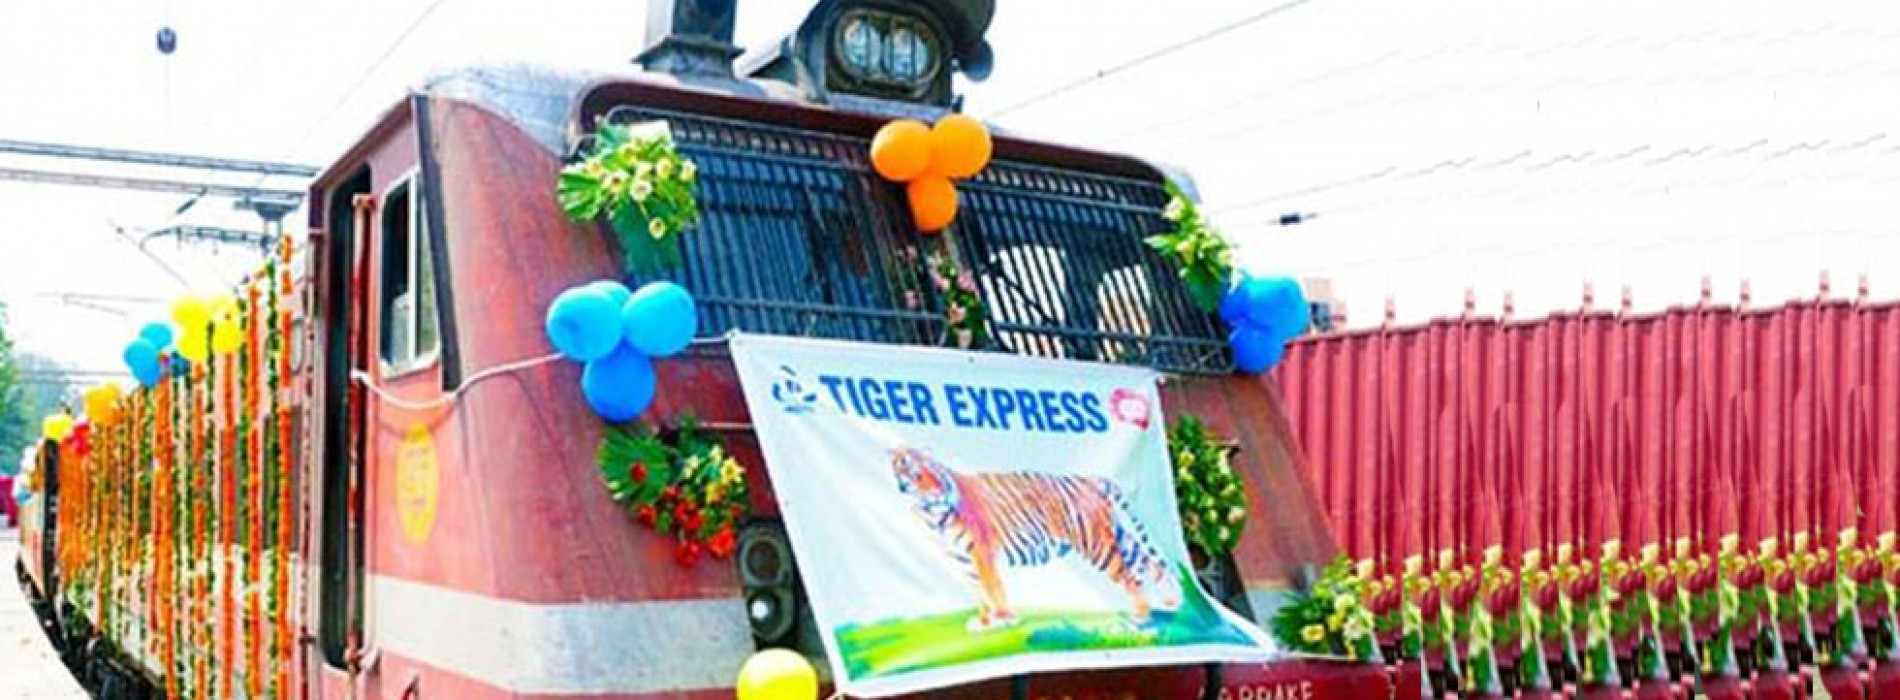 Indian Railways inaugurates 'Tiger Express' train